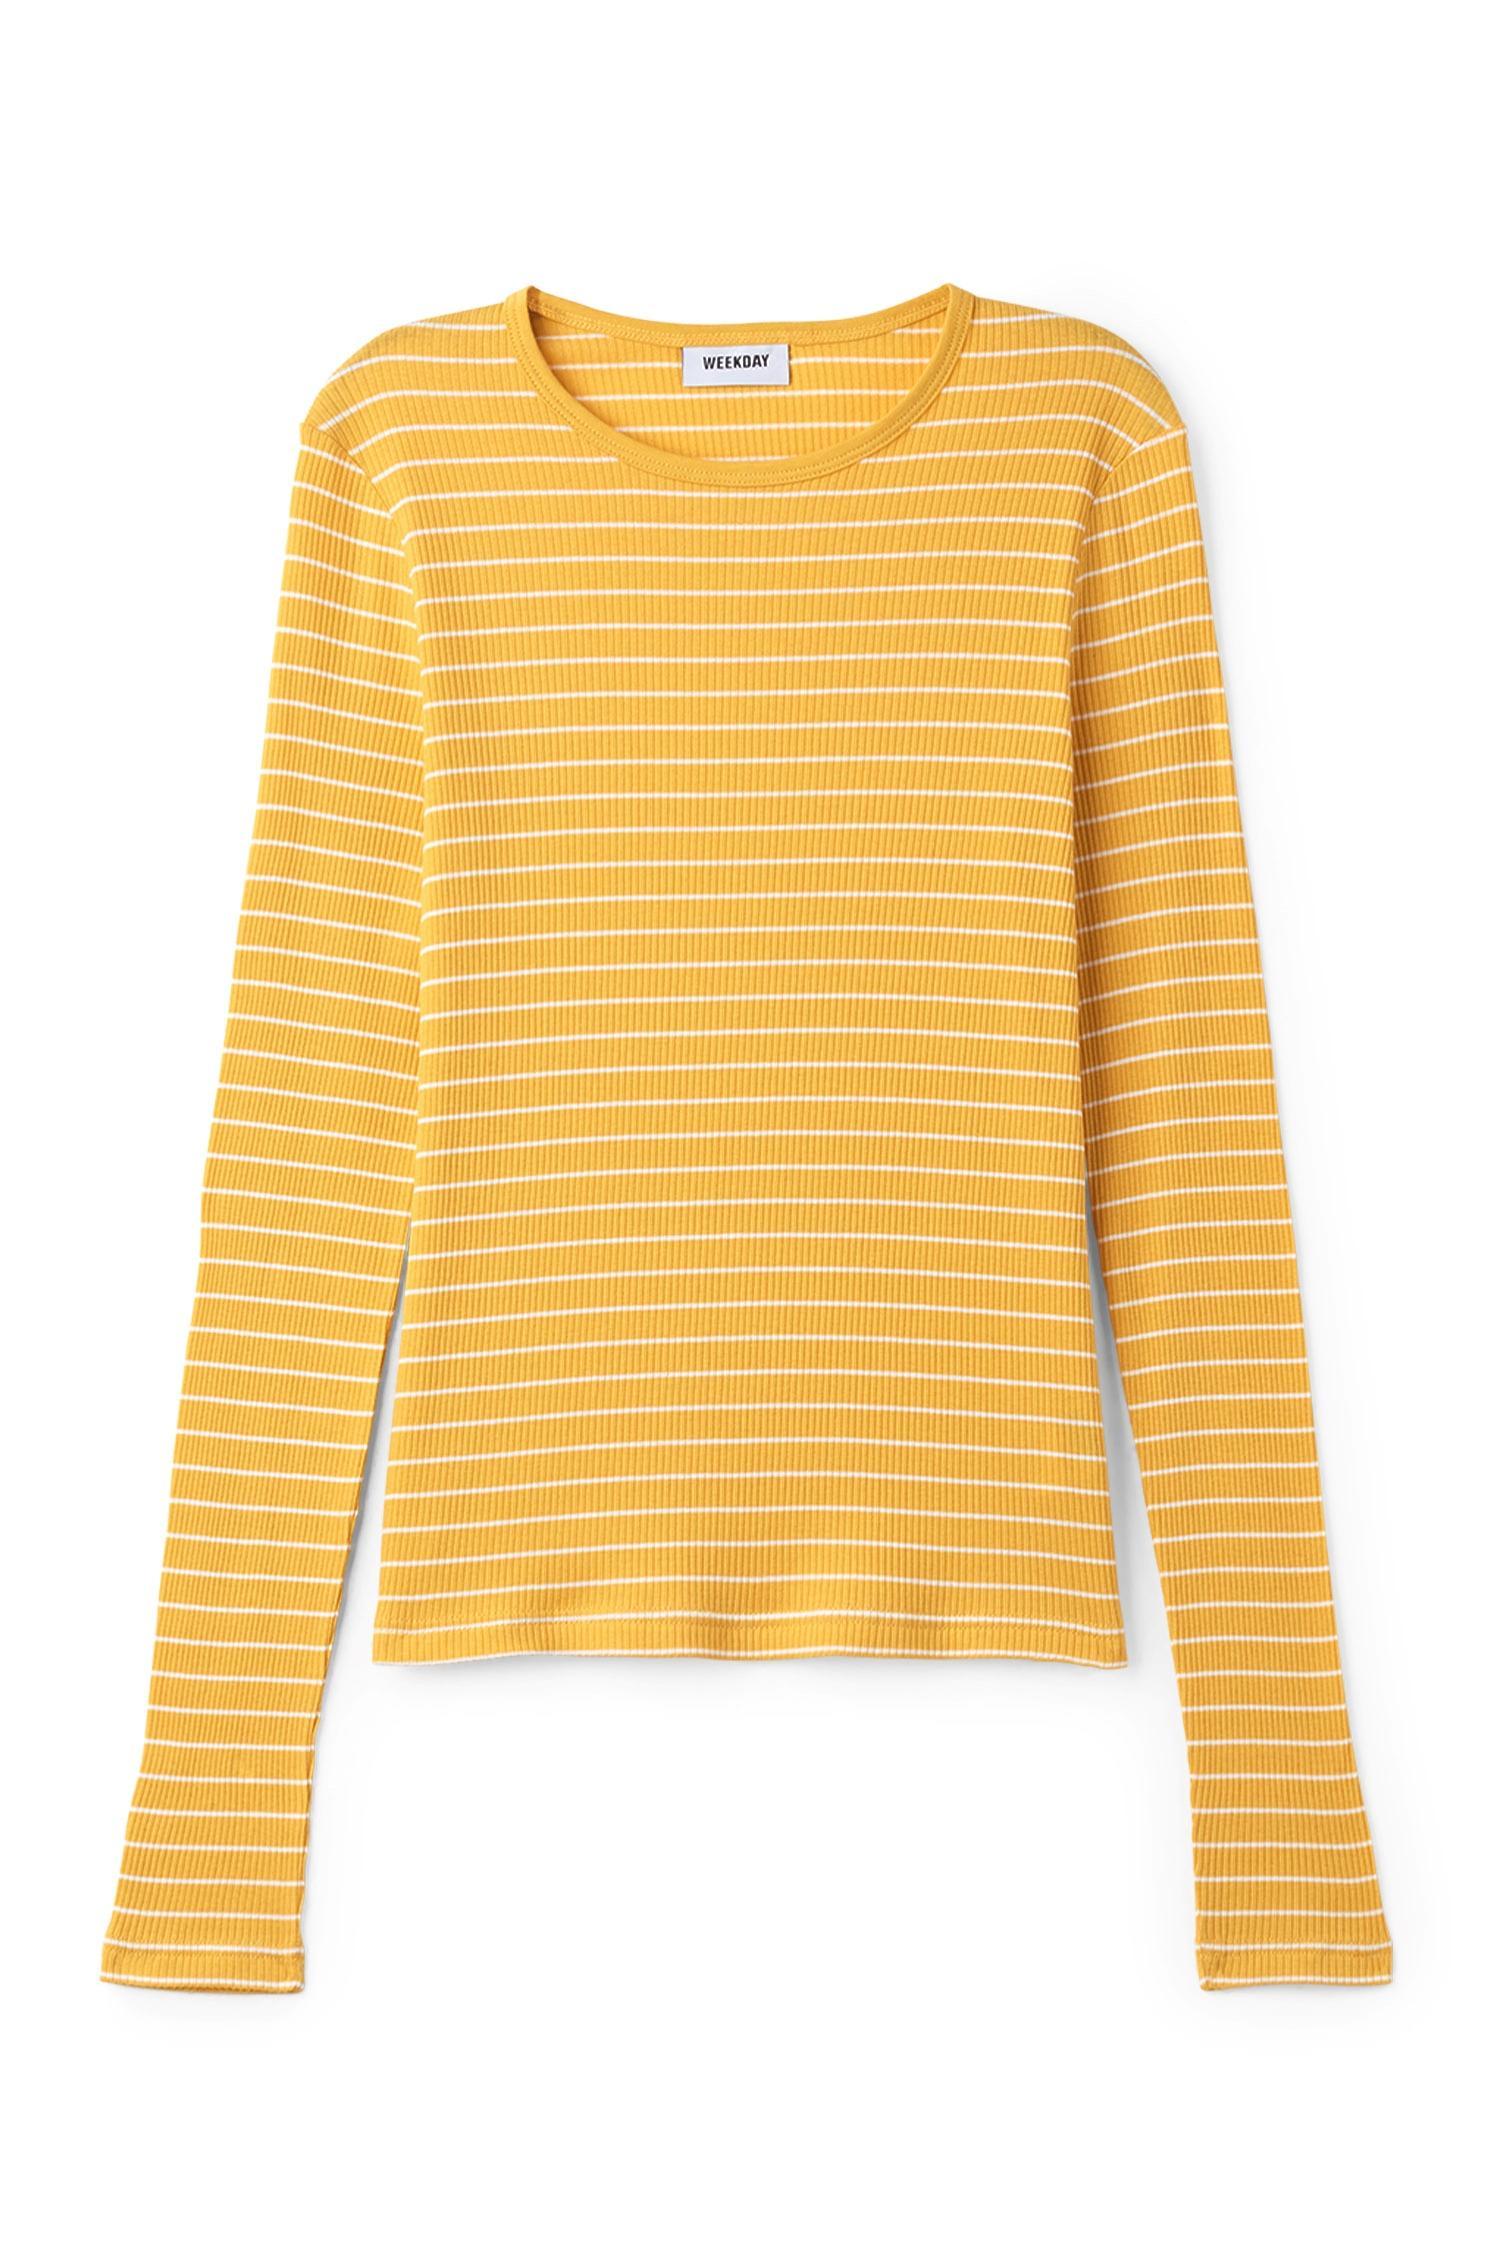 Weekday tina long sleeve t shirt in yellow lyst for Yellow long sleeved t shirt